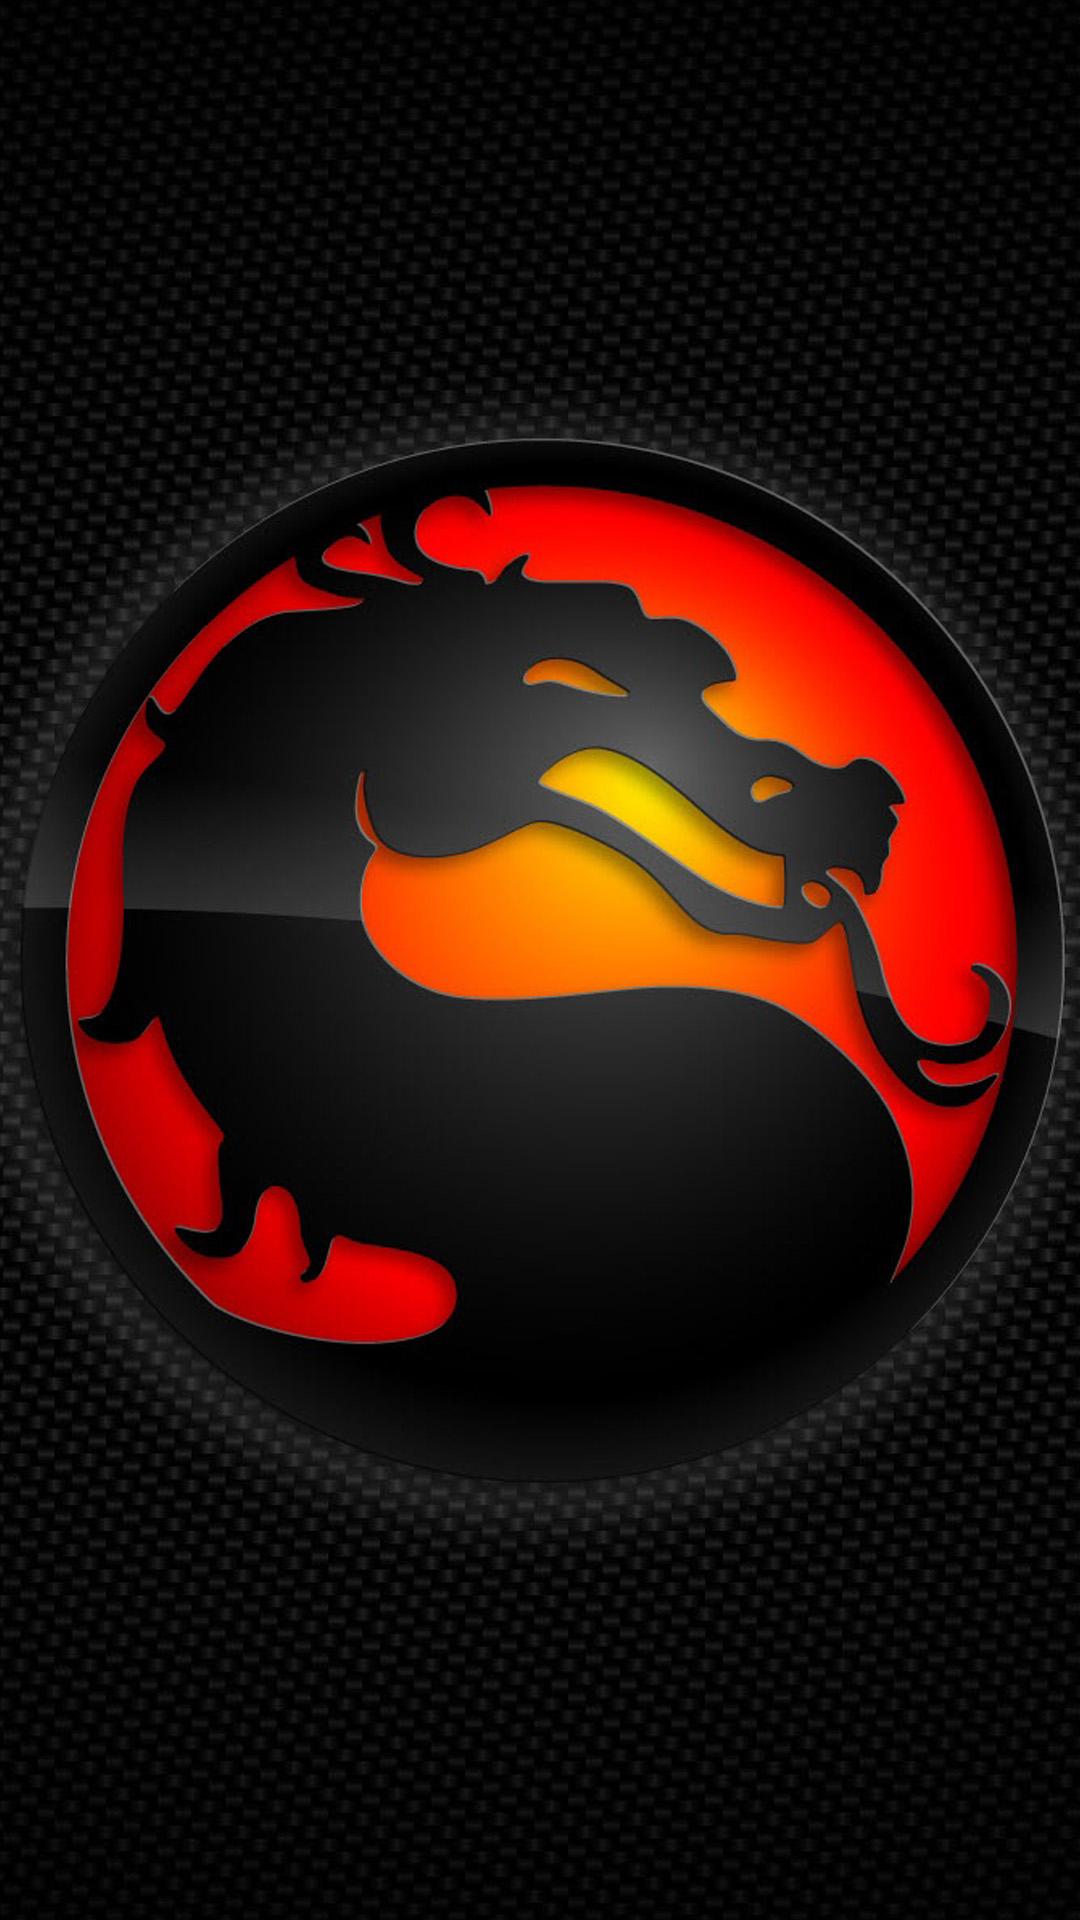 Mortal Kombat Logo Galaxy S5 Wallpapers Samsung Galaxy S5 Wallpapers 1080x1920